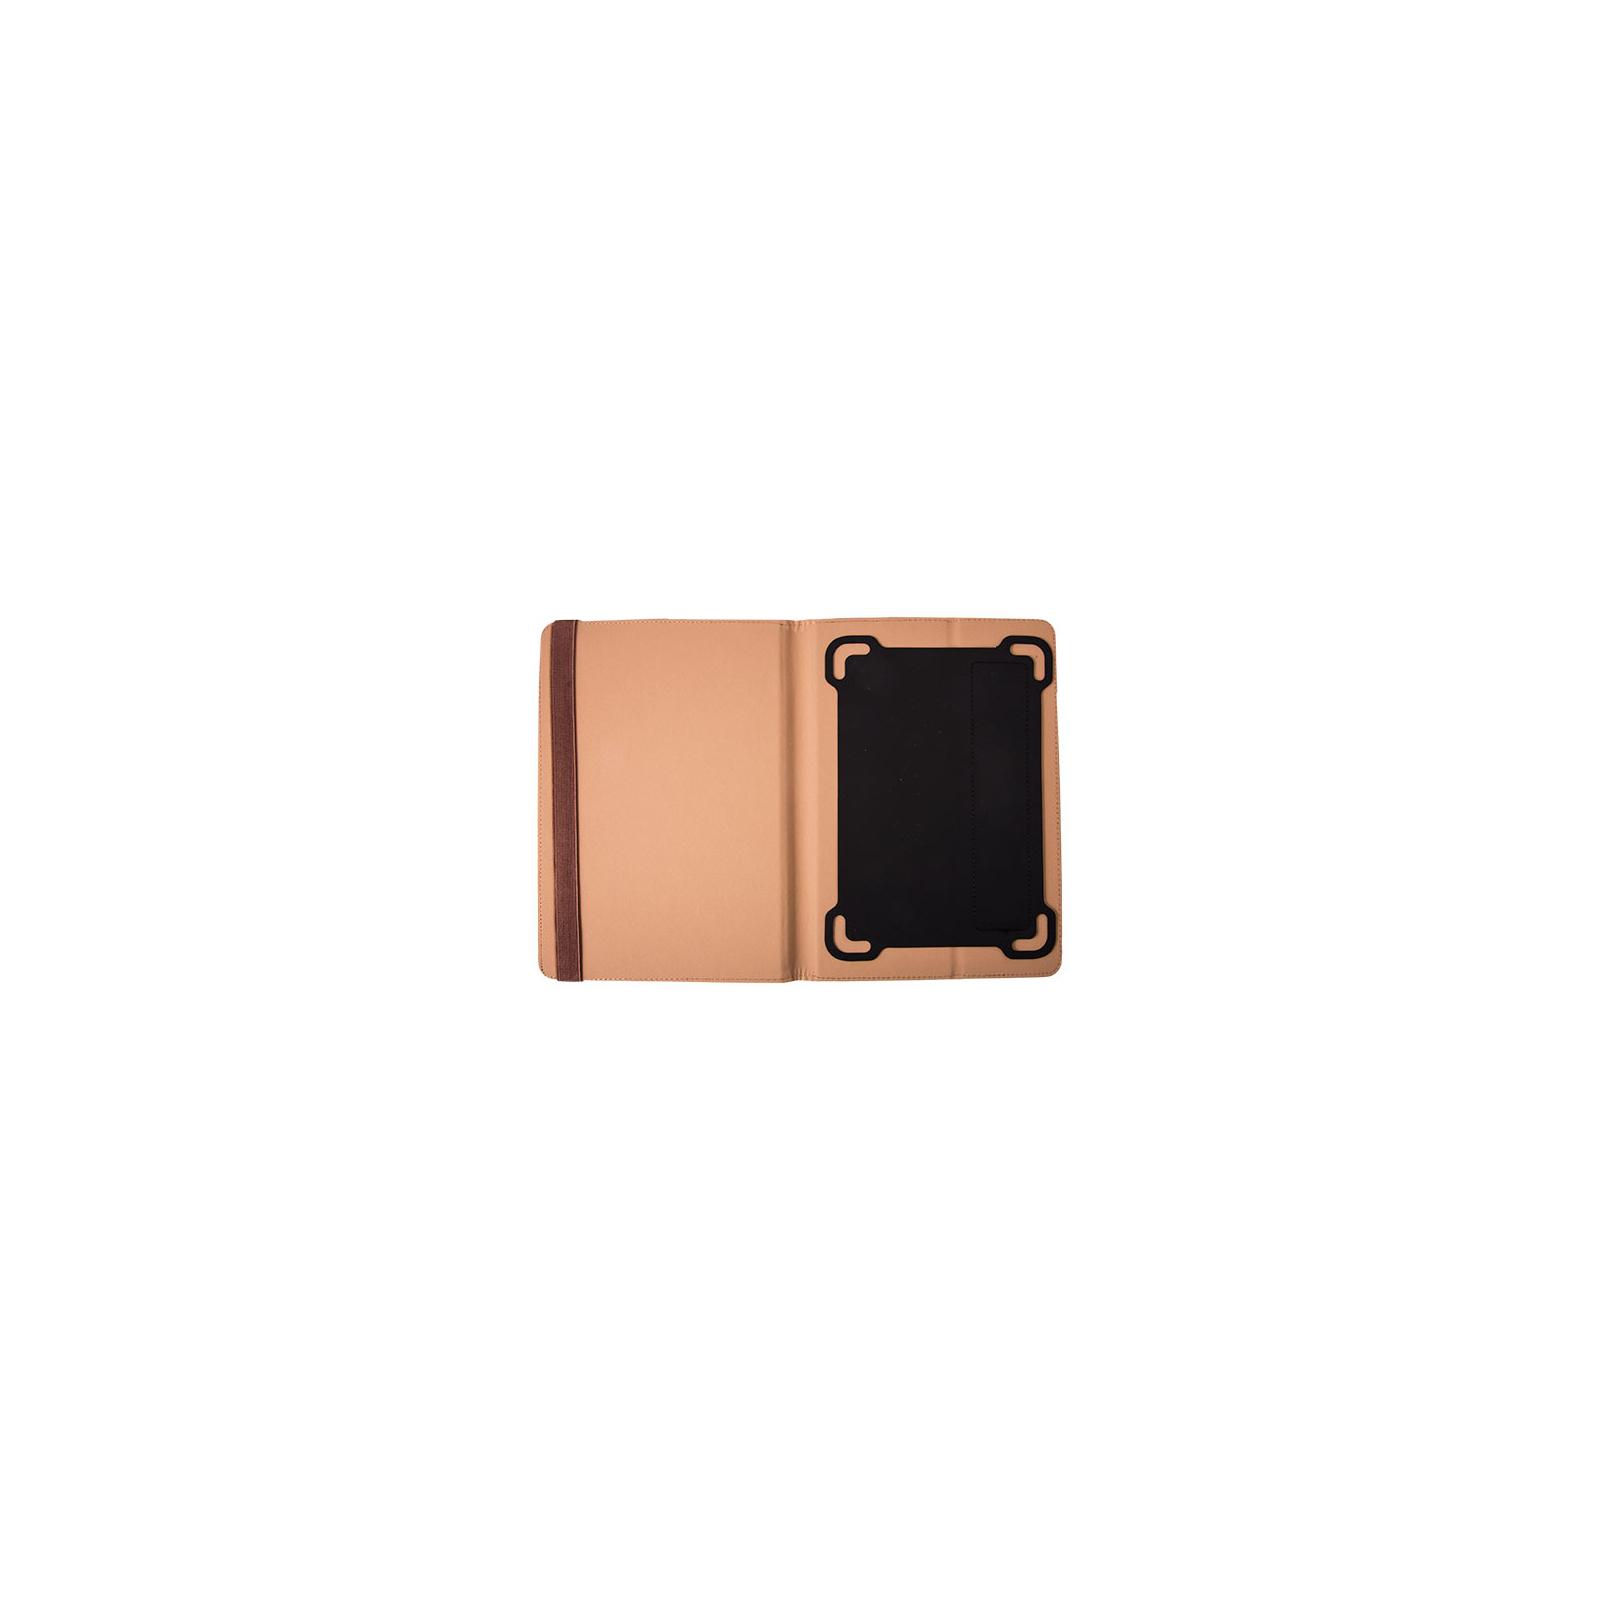 "Чехол для планшета Vellini 10-10,1"" Universal stand Brown (216868) изображение 2"